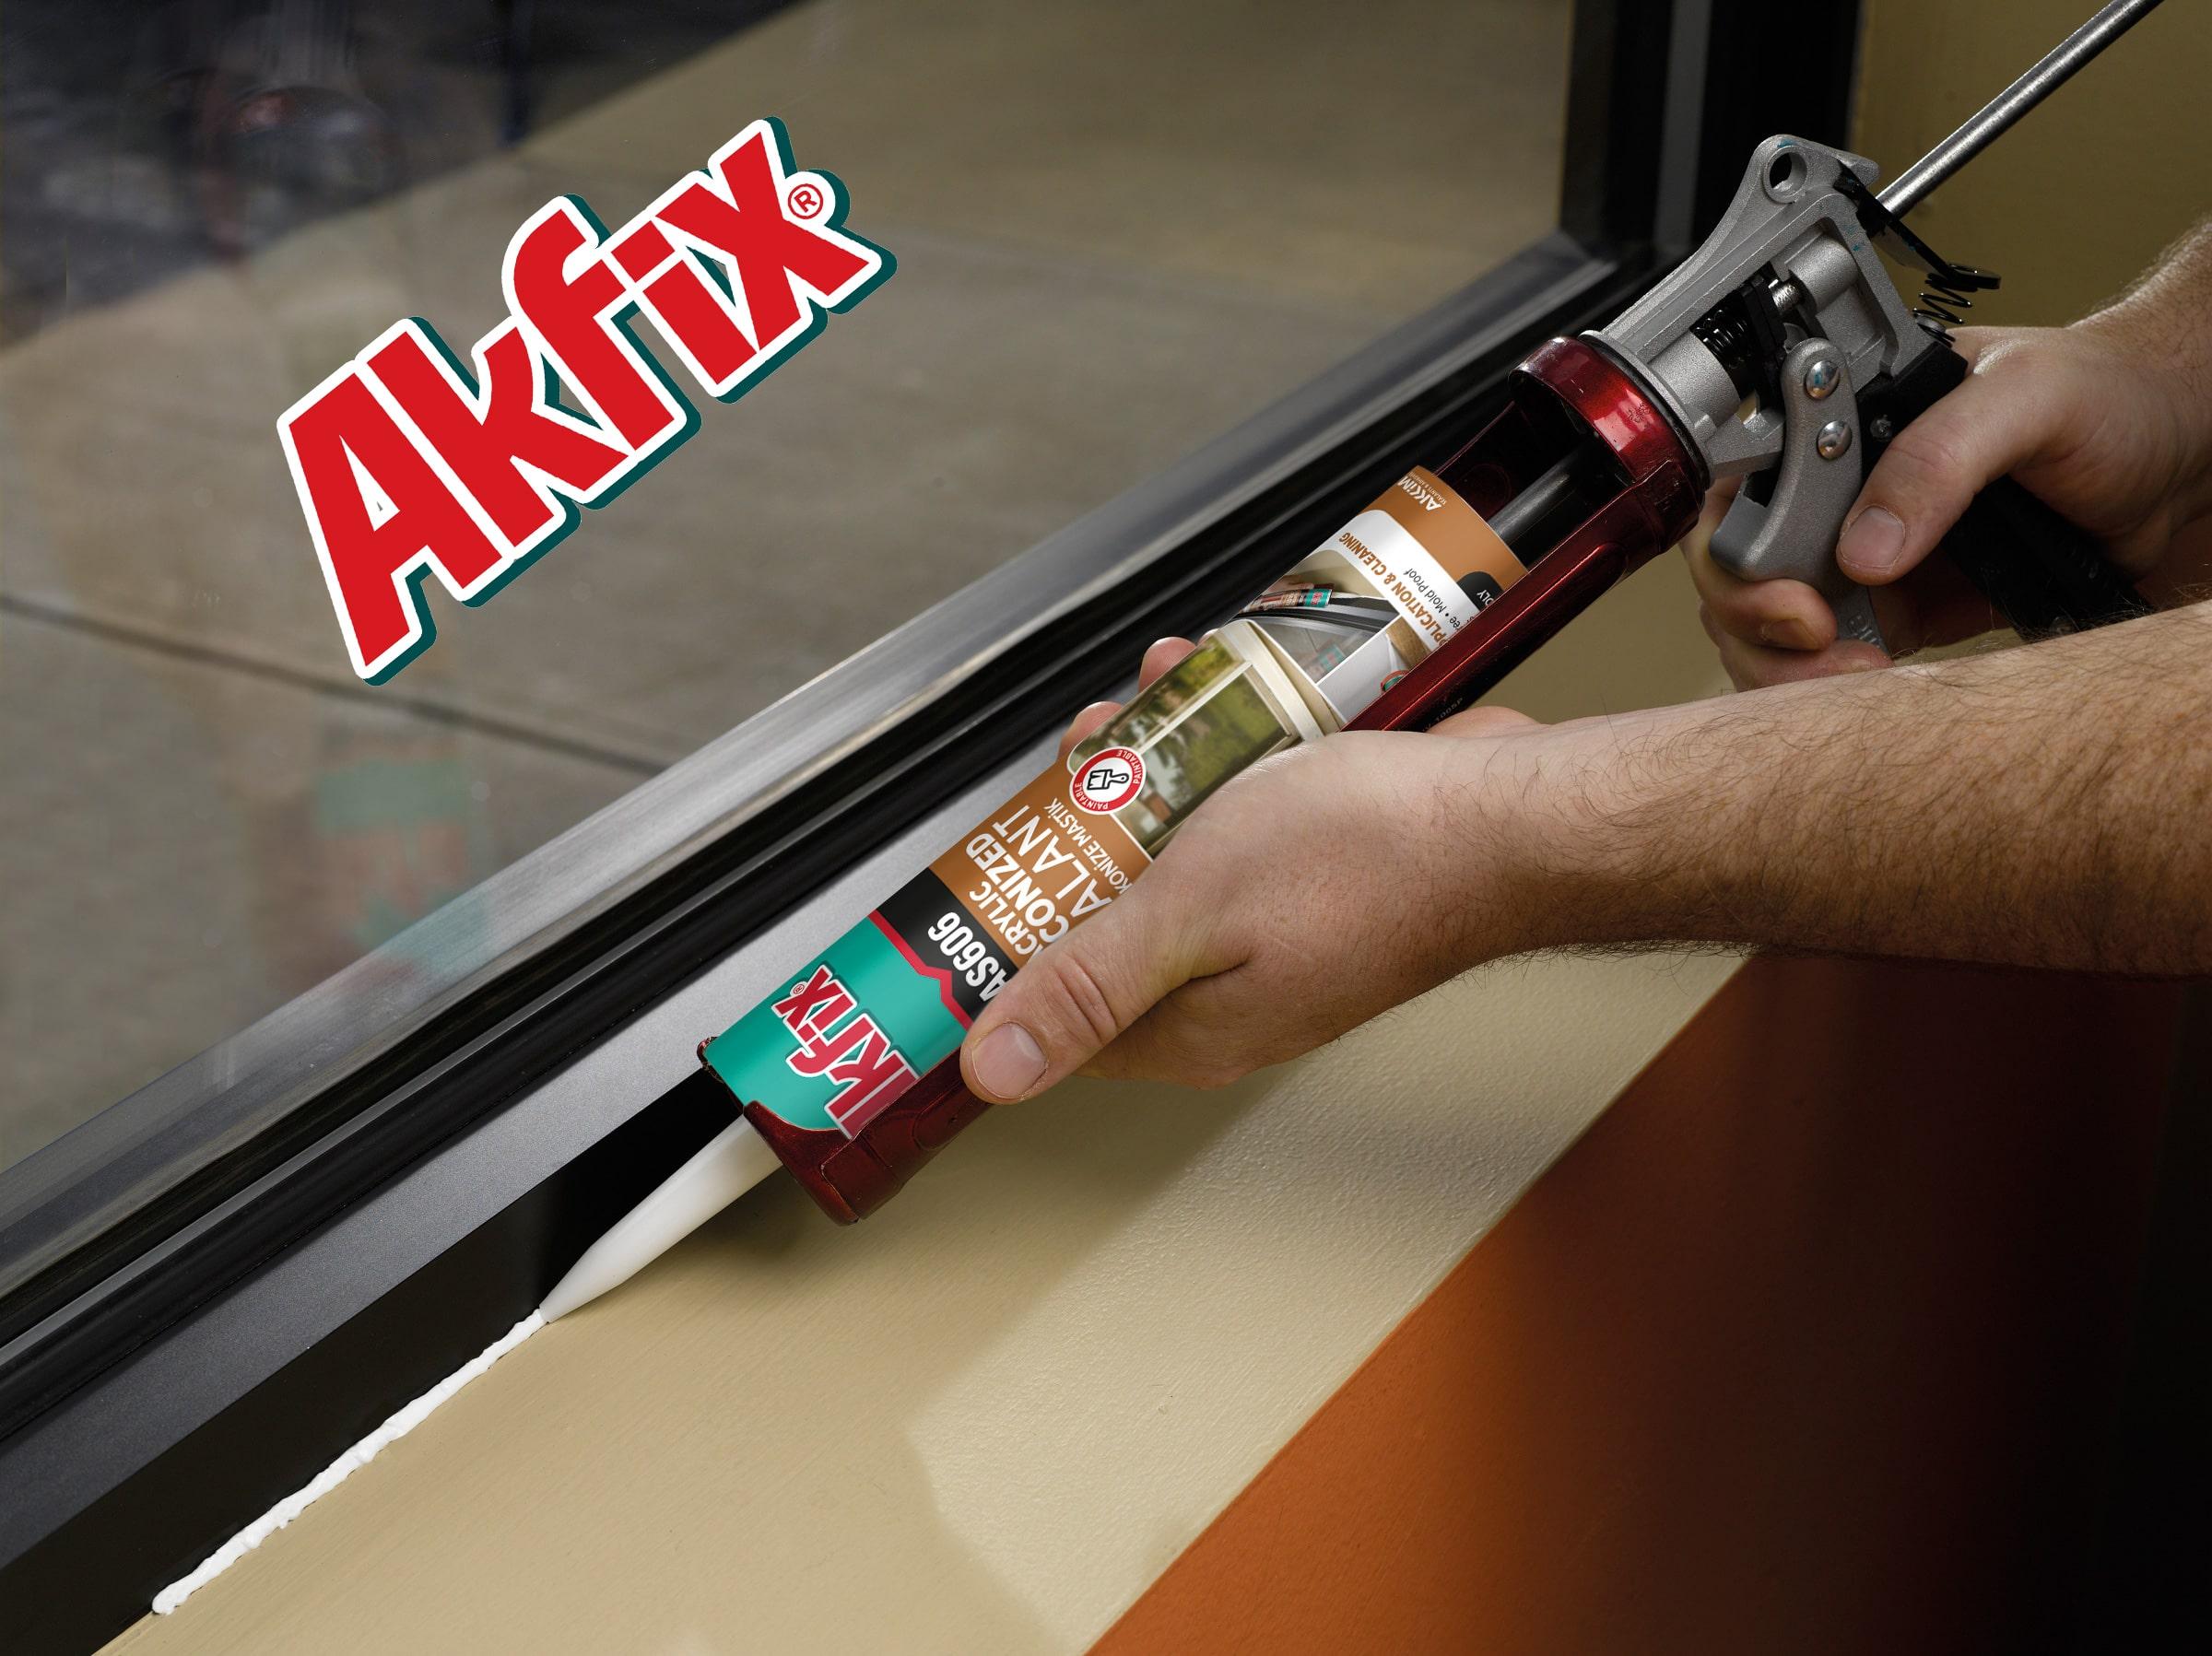 درزگیر اکریلیک سیلیکونی آکفیکس Akfix AS606